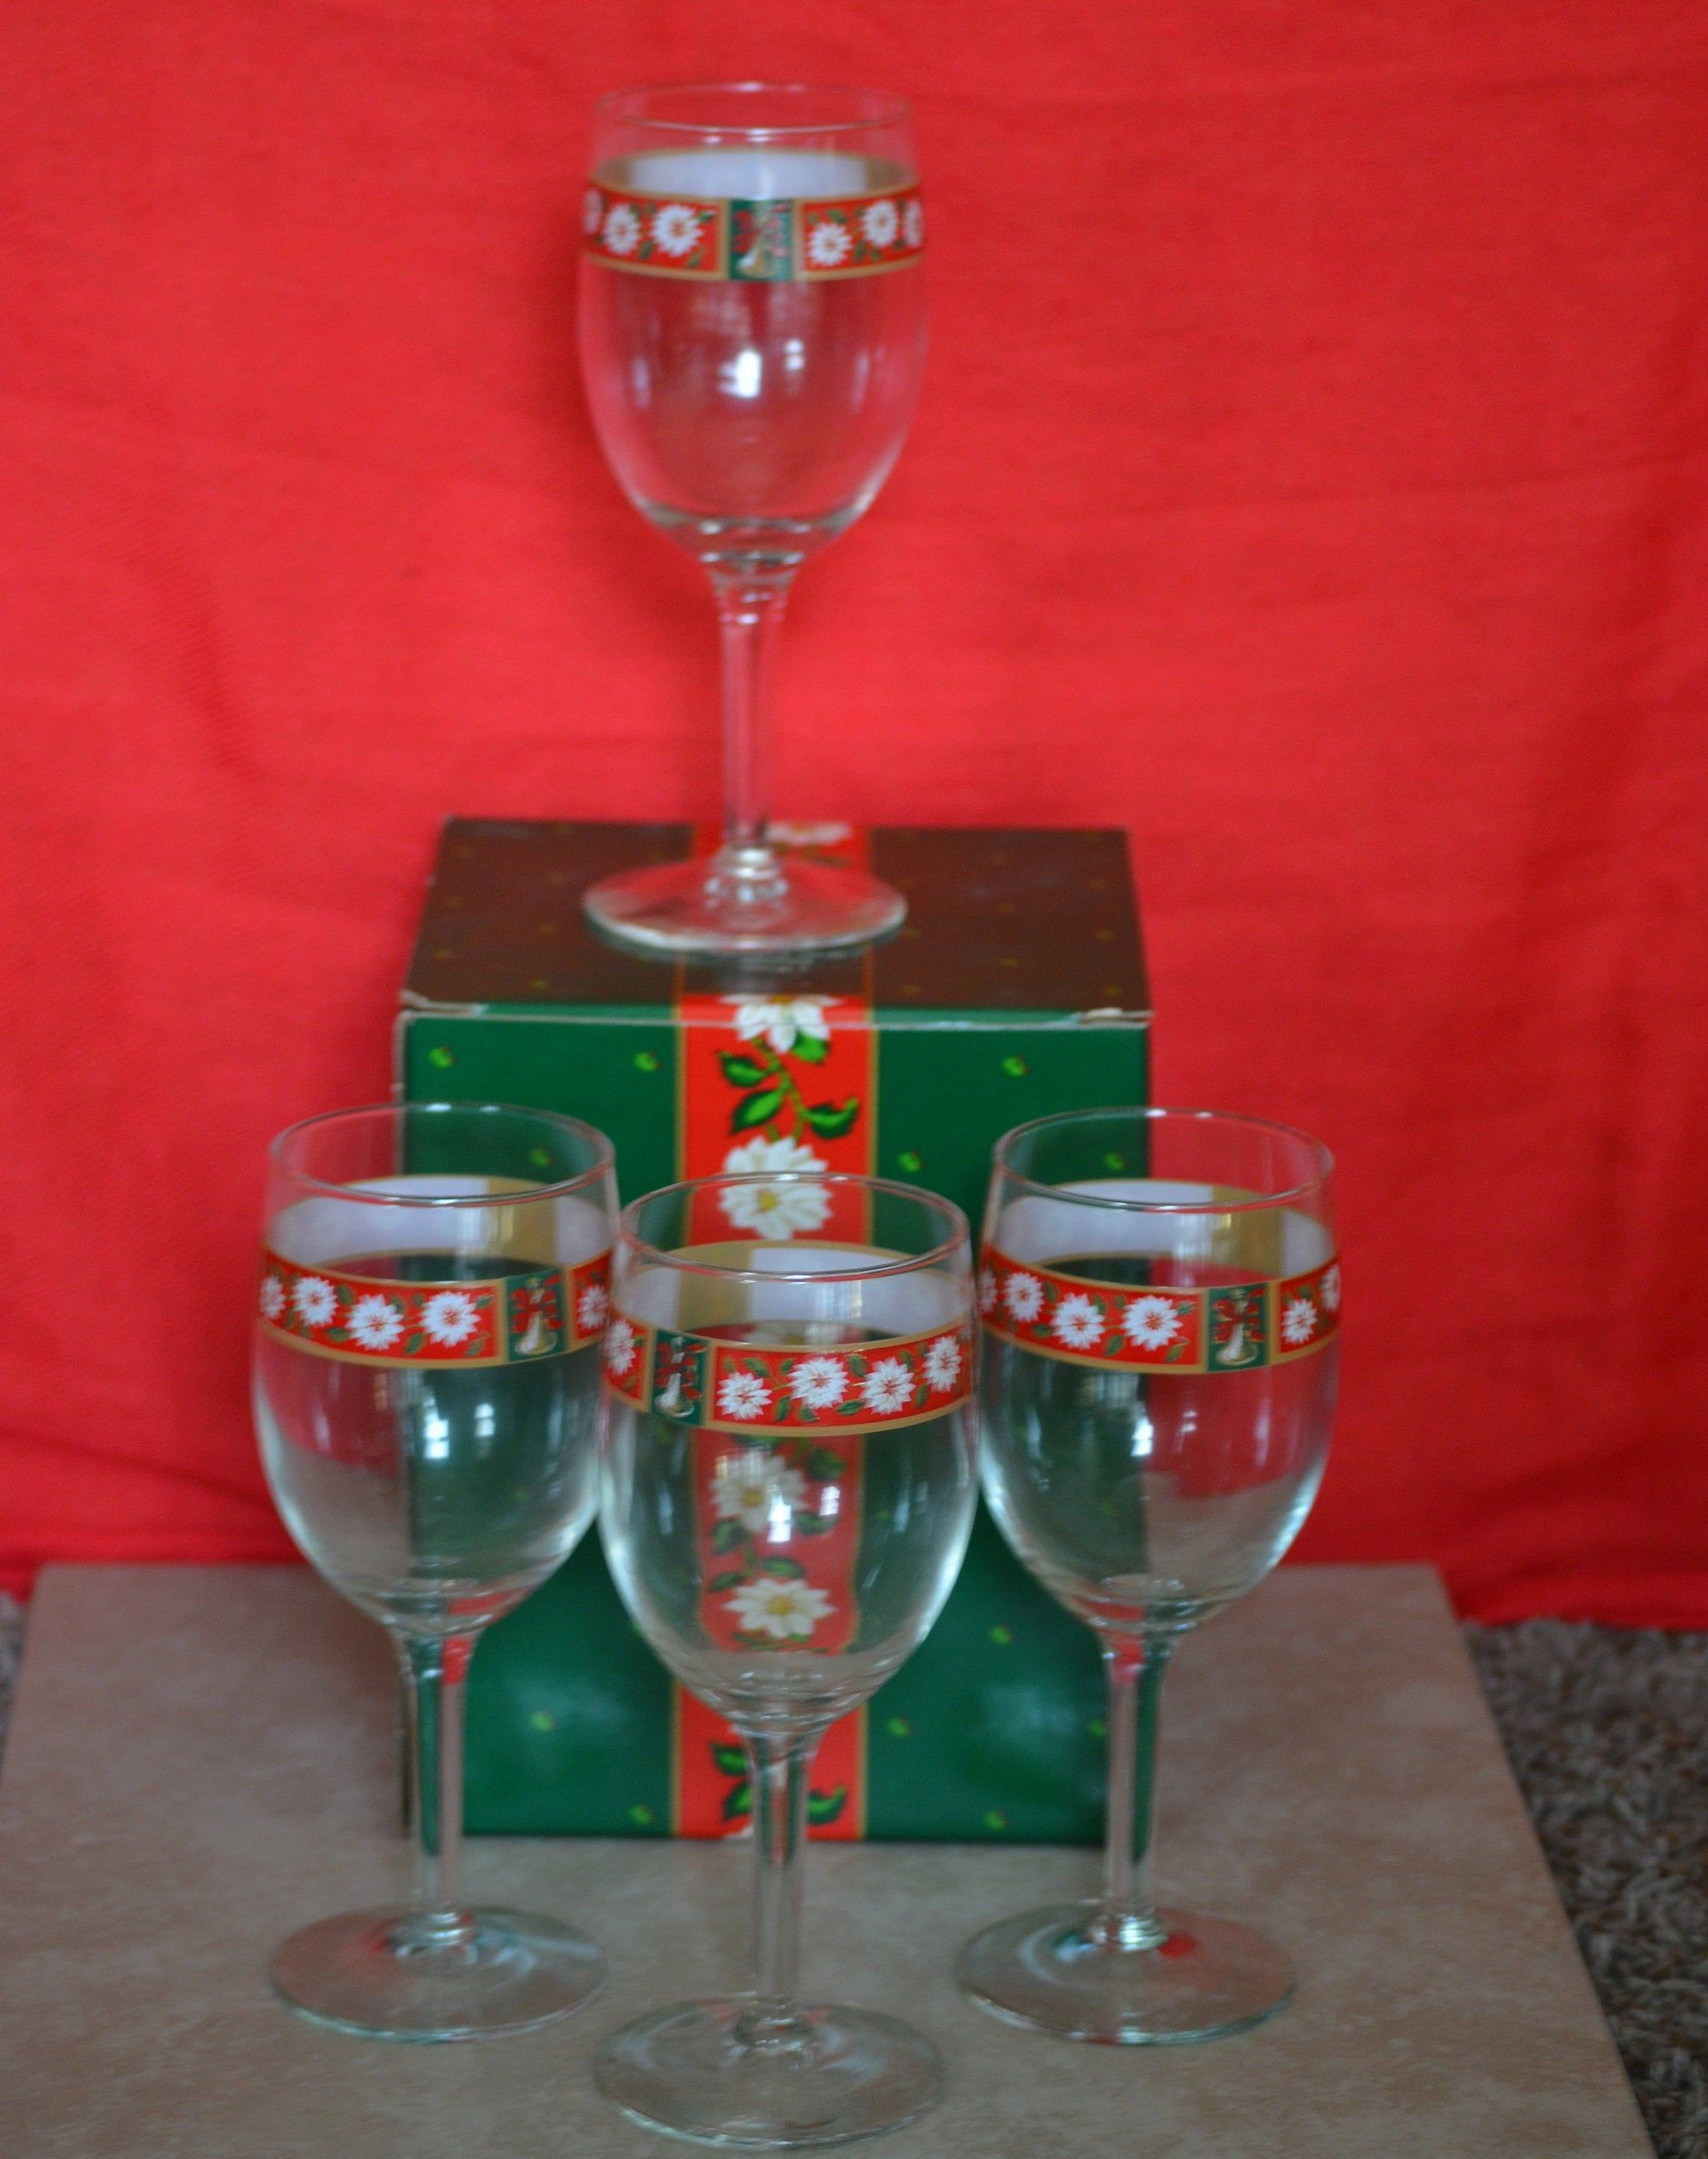 Christmas Wine Glassescharlton Hall Kobe Set Of 4 1985 1995 Etsy Christmas Wine Glasses Wine Glasses Christmas Wine